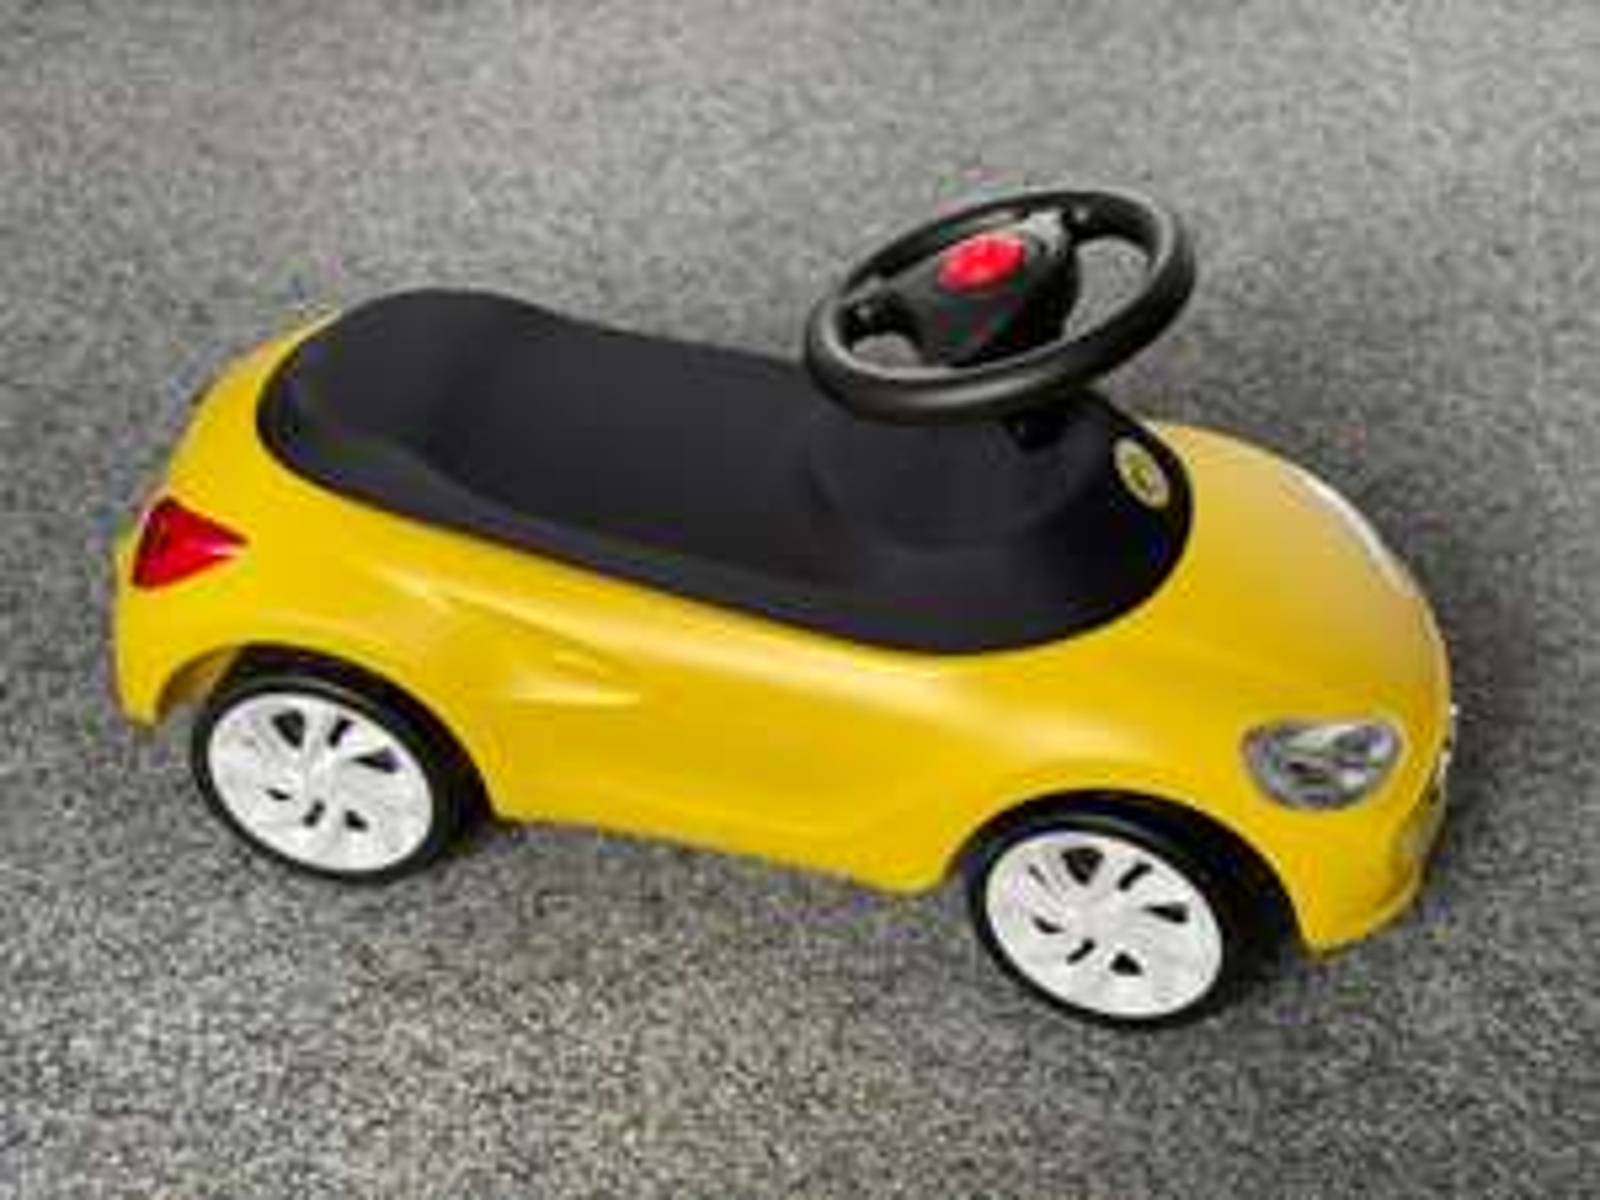 ADAM Opel Rutschauto Rutscher Schub Car Auto Lauflernhilfe Kind Fahrzeug BVB FAN